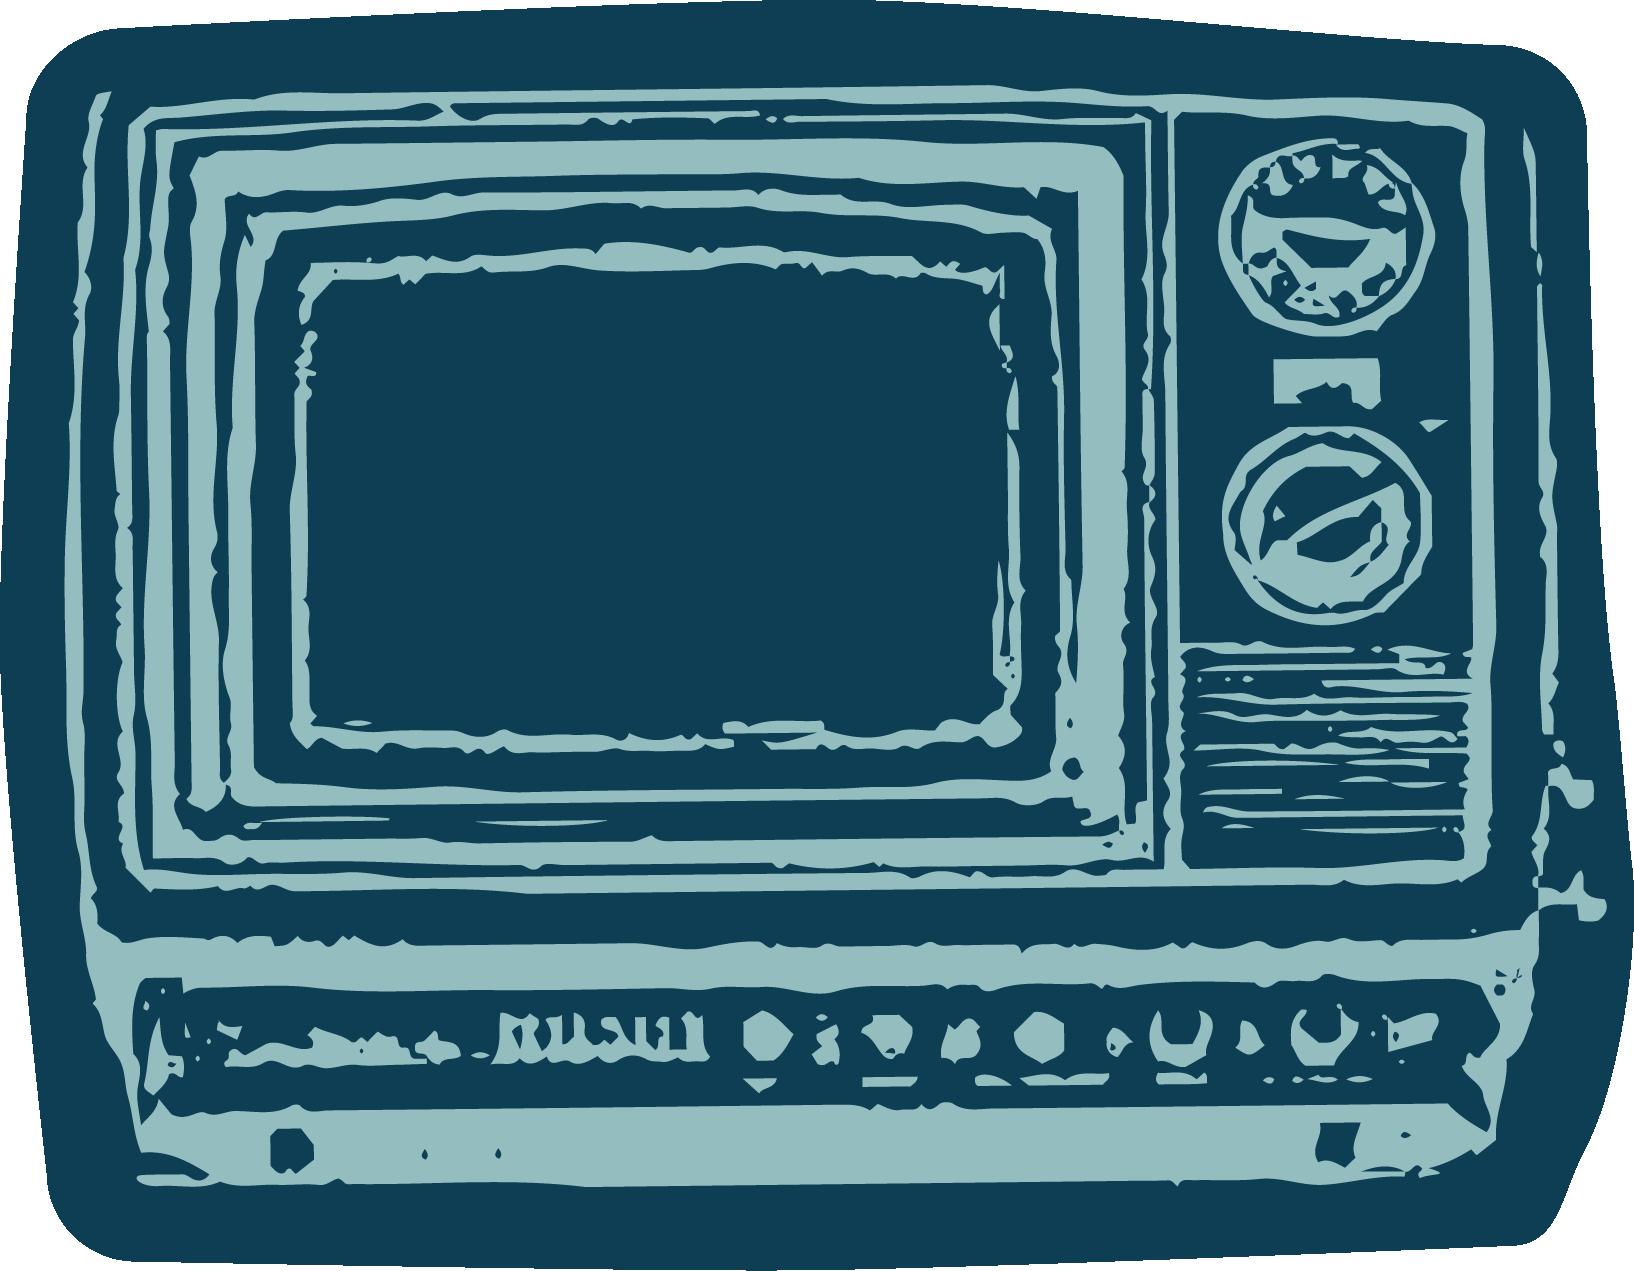 WATCH_TV.png